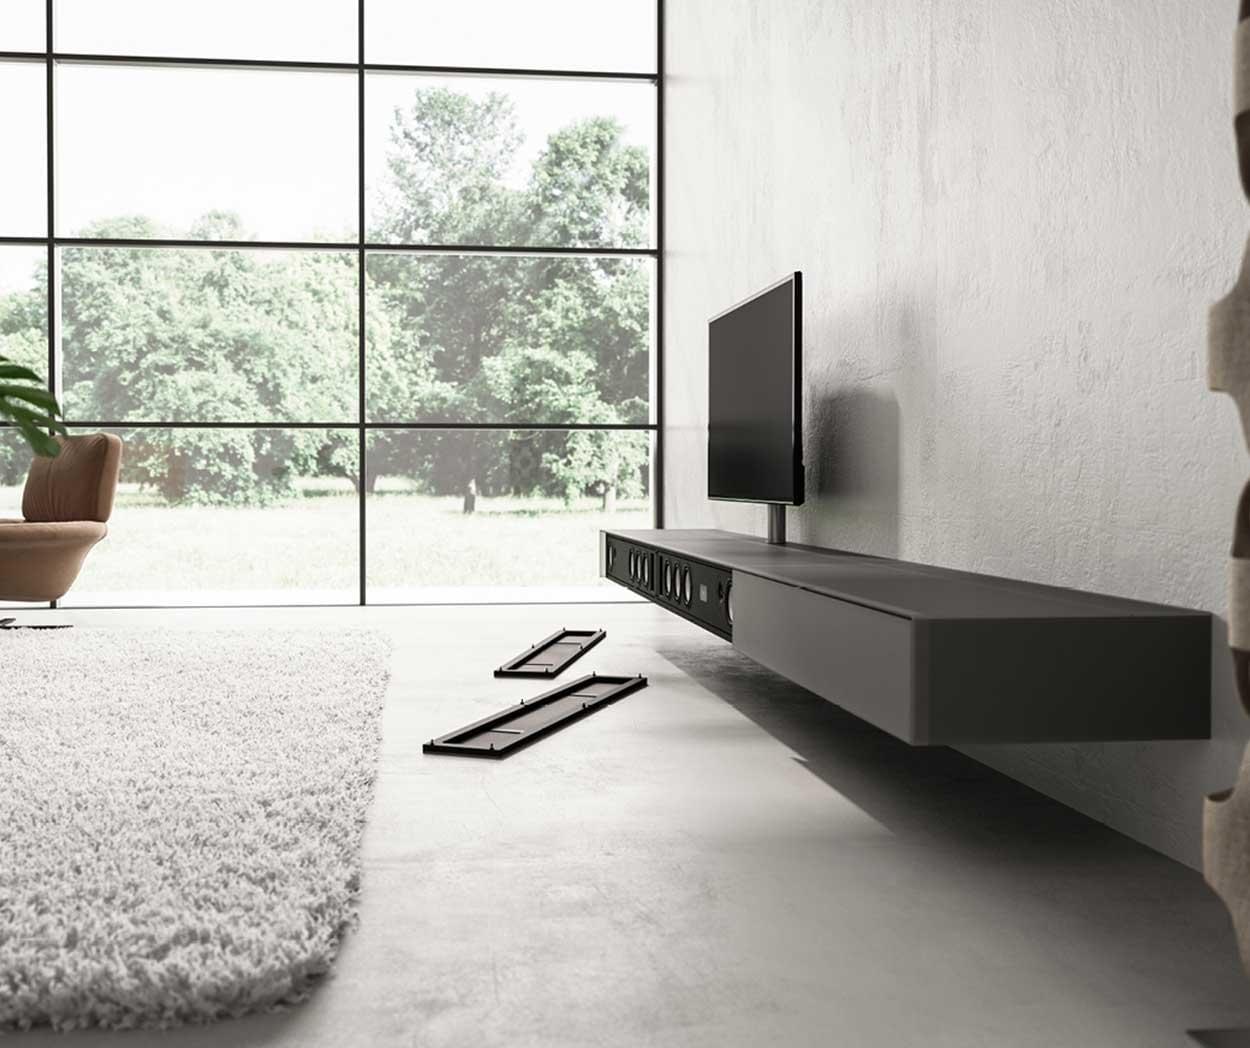 Kast Onder Tv.Zwevende Tv Meubels Top Kwaliteit Van Spectral Nl